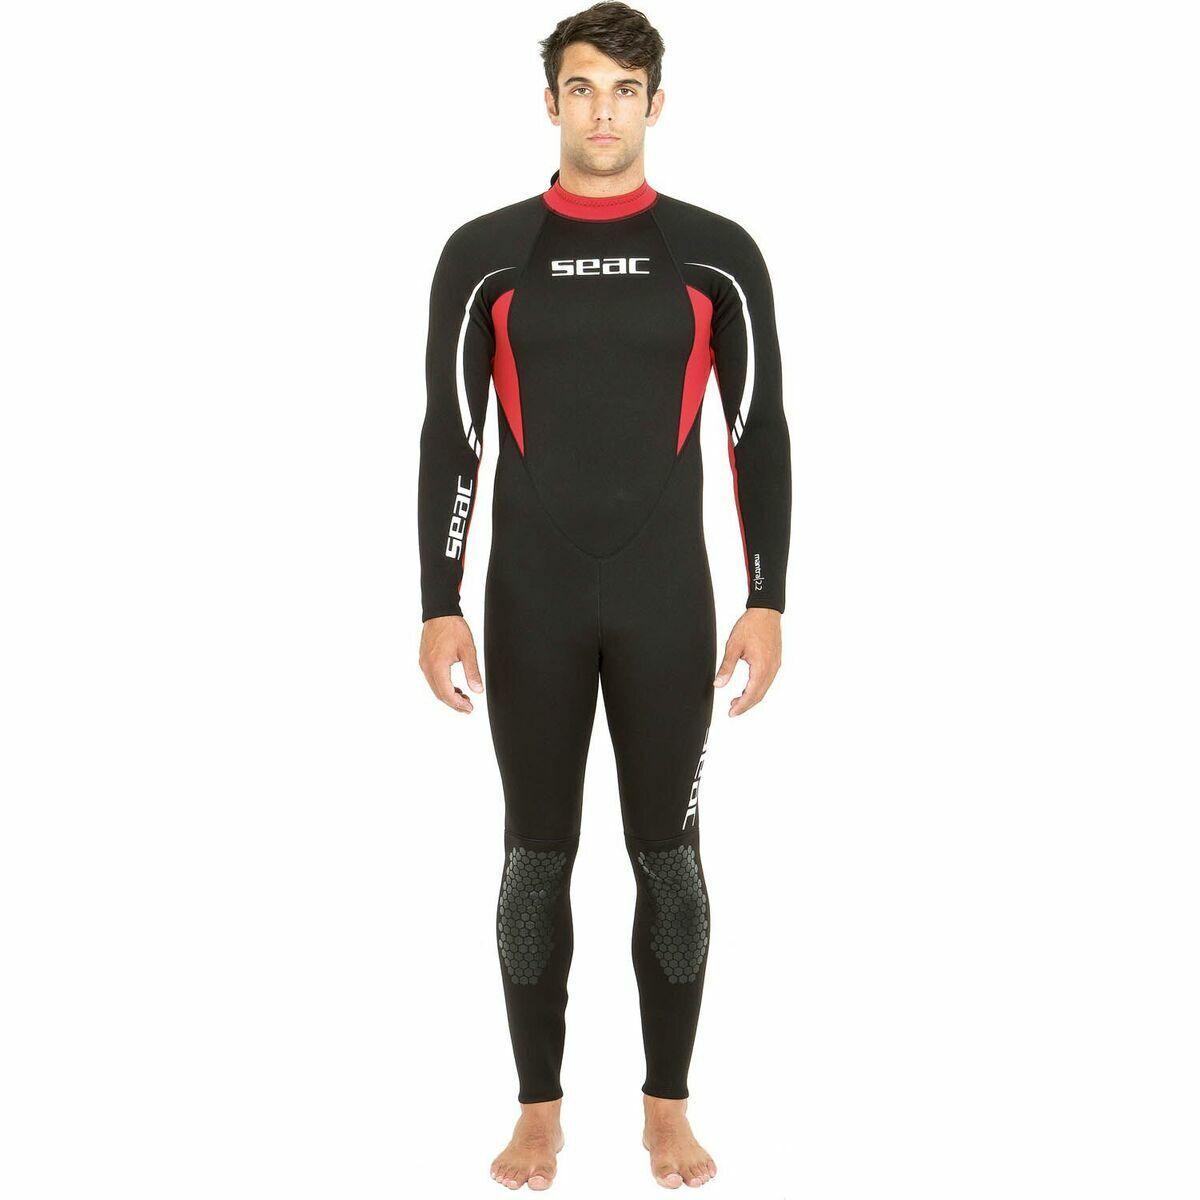 SEAC Diving Suit Relax Long 2,2mm Diving Suit Water Sport Wetsuit Herren